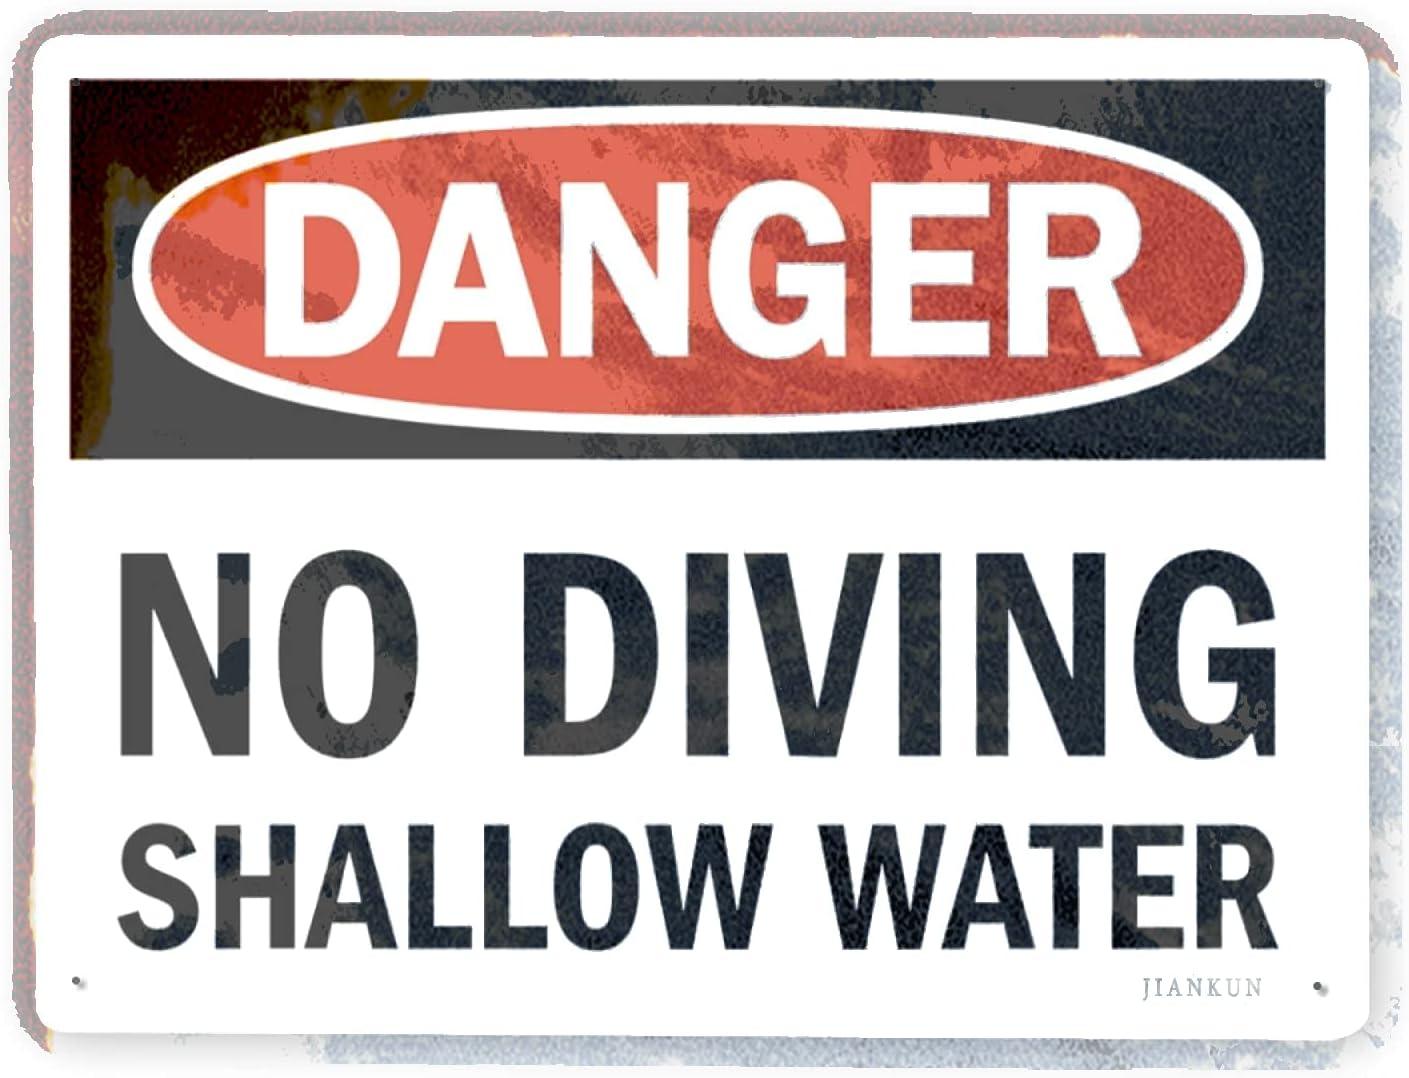 J.DXHYA Man Cave OFFicial site Decor 2 Pieces Divi Warning Sign No Max 81% OFF Danger